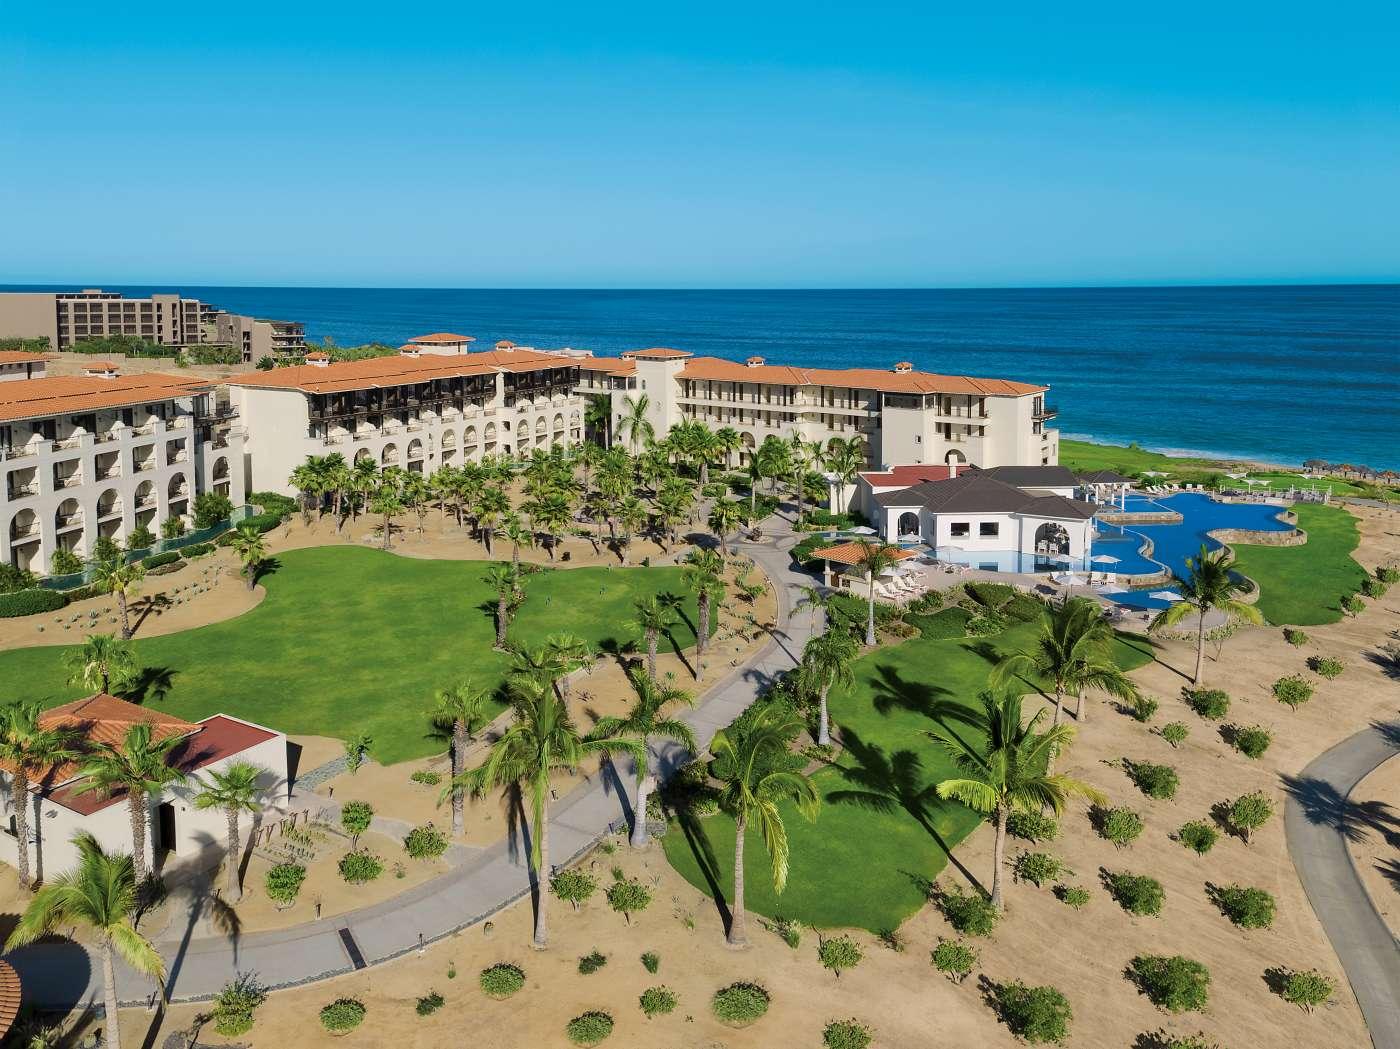 Aerial of luxury resort set in a desert surrounding along coastline